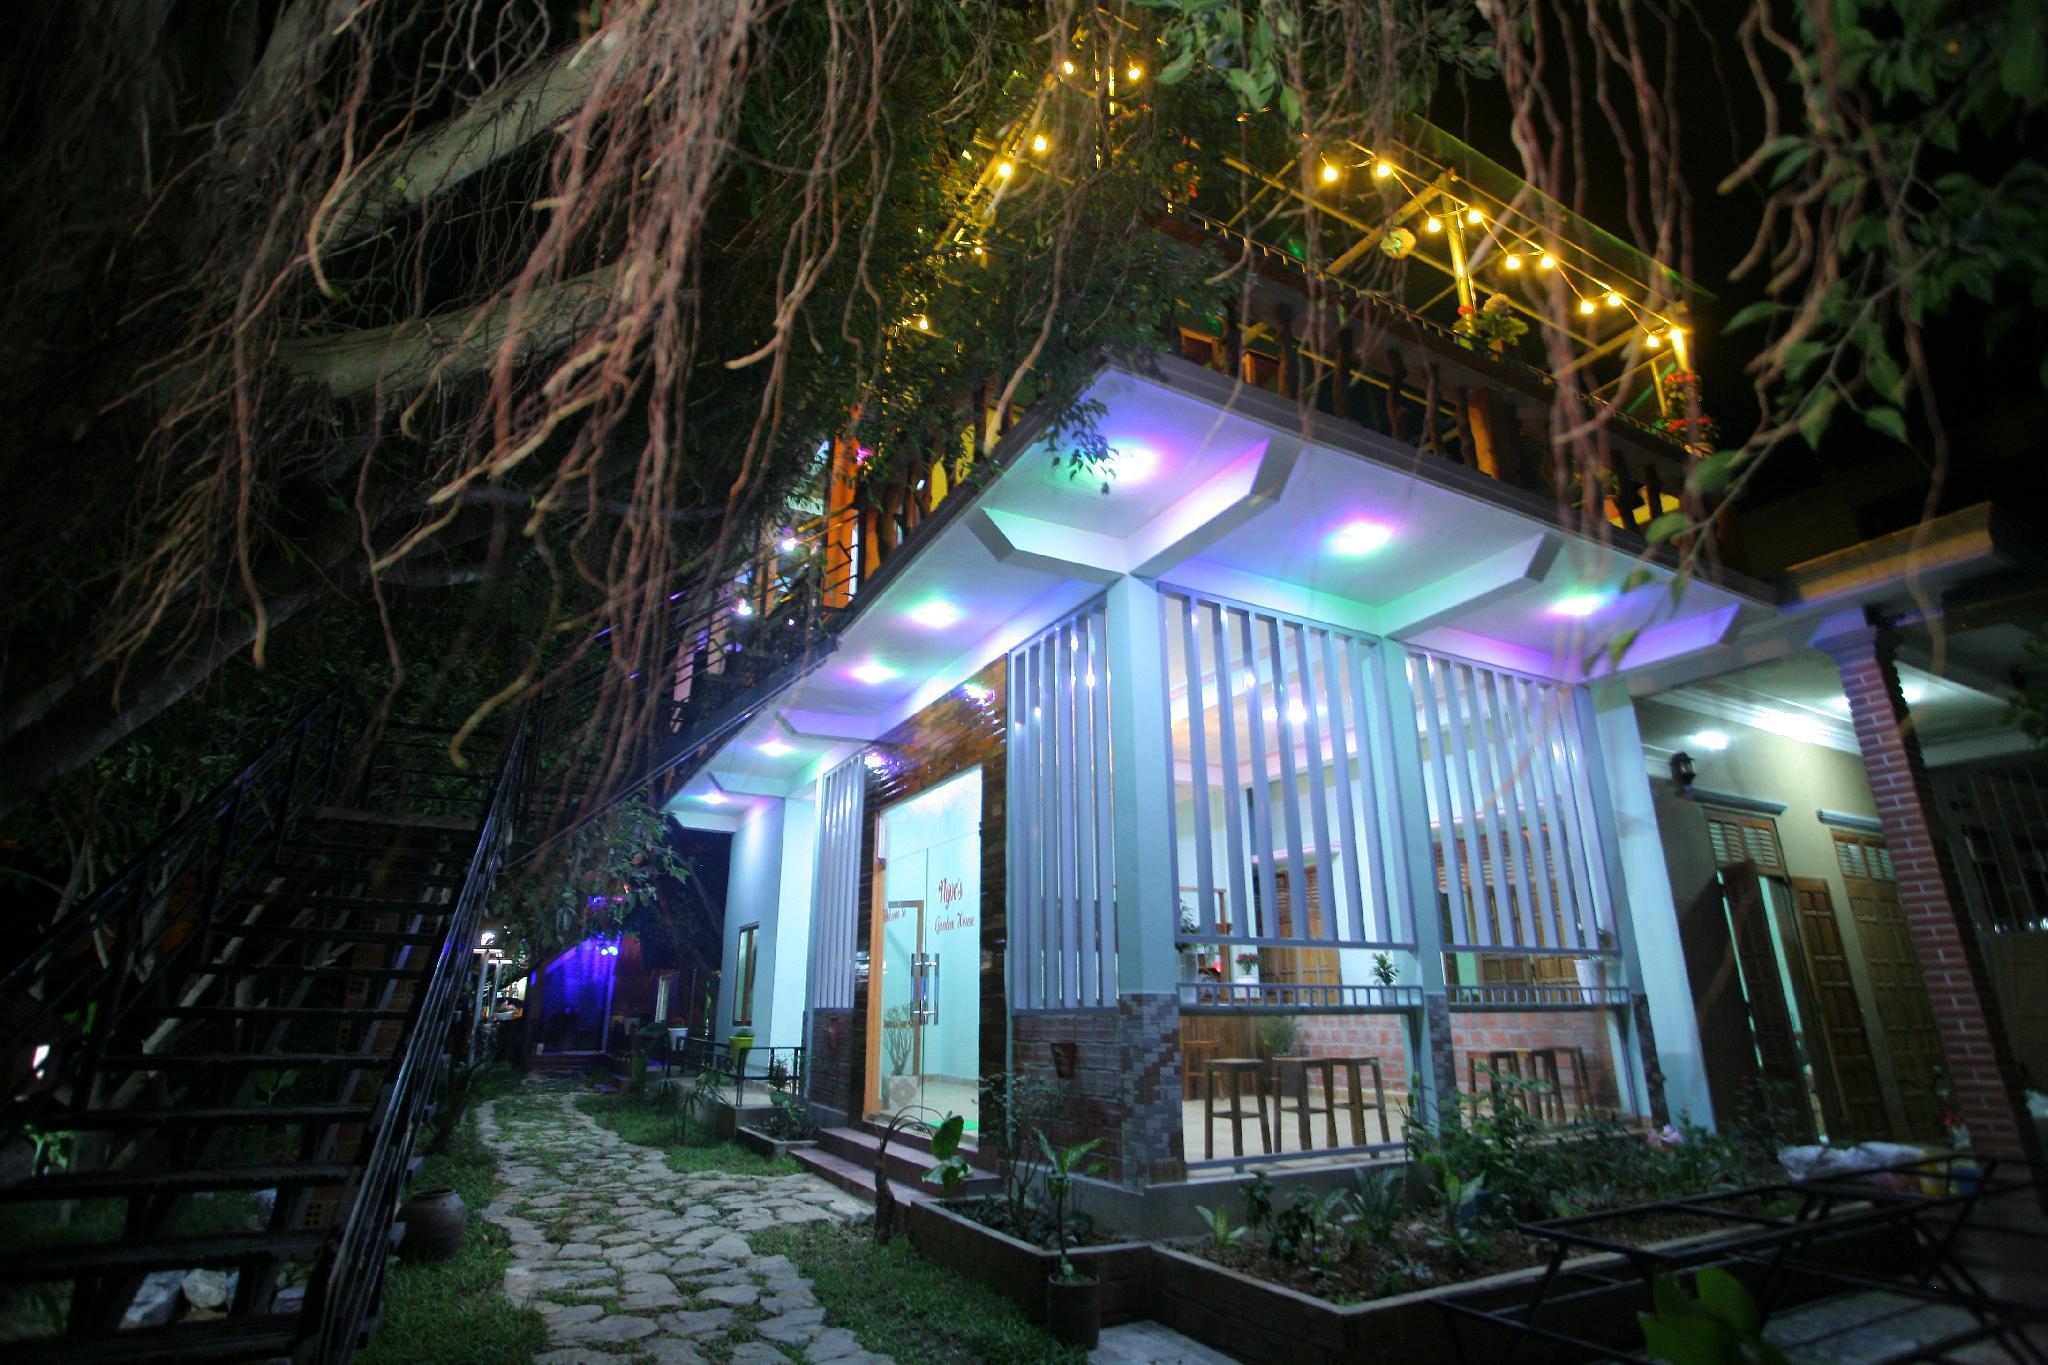 Ngoc's Gader House